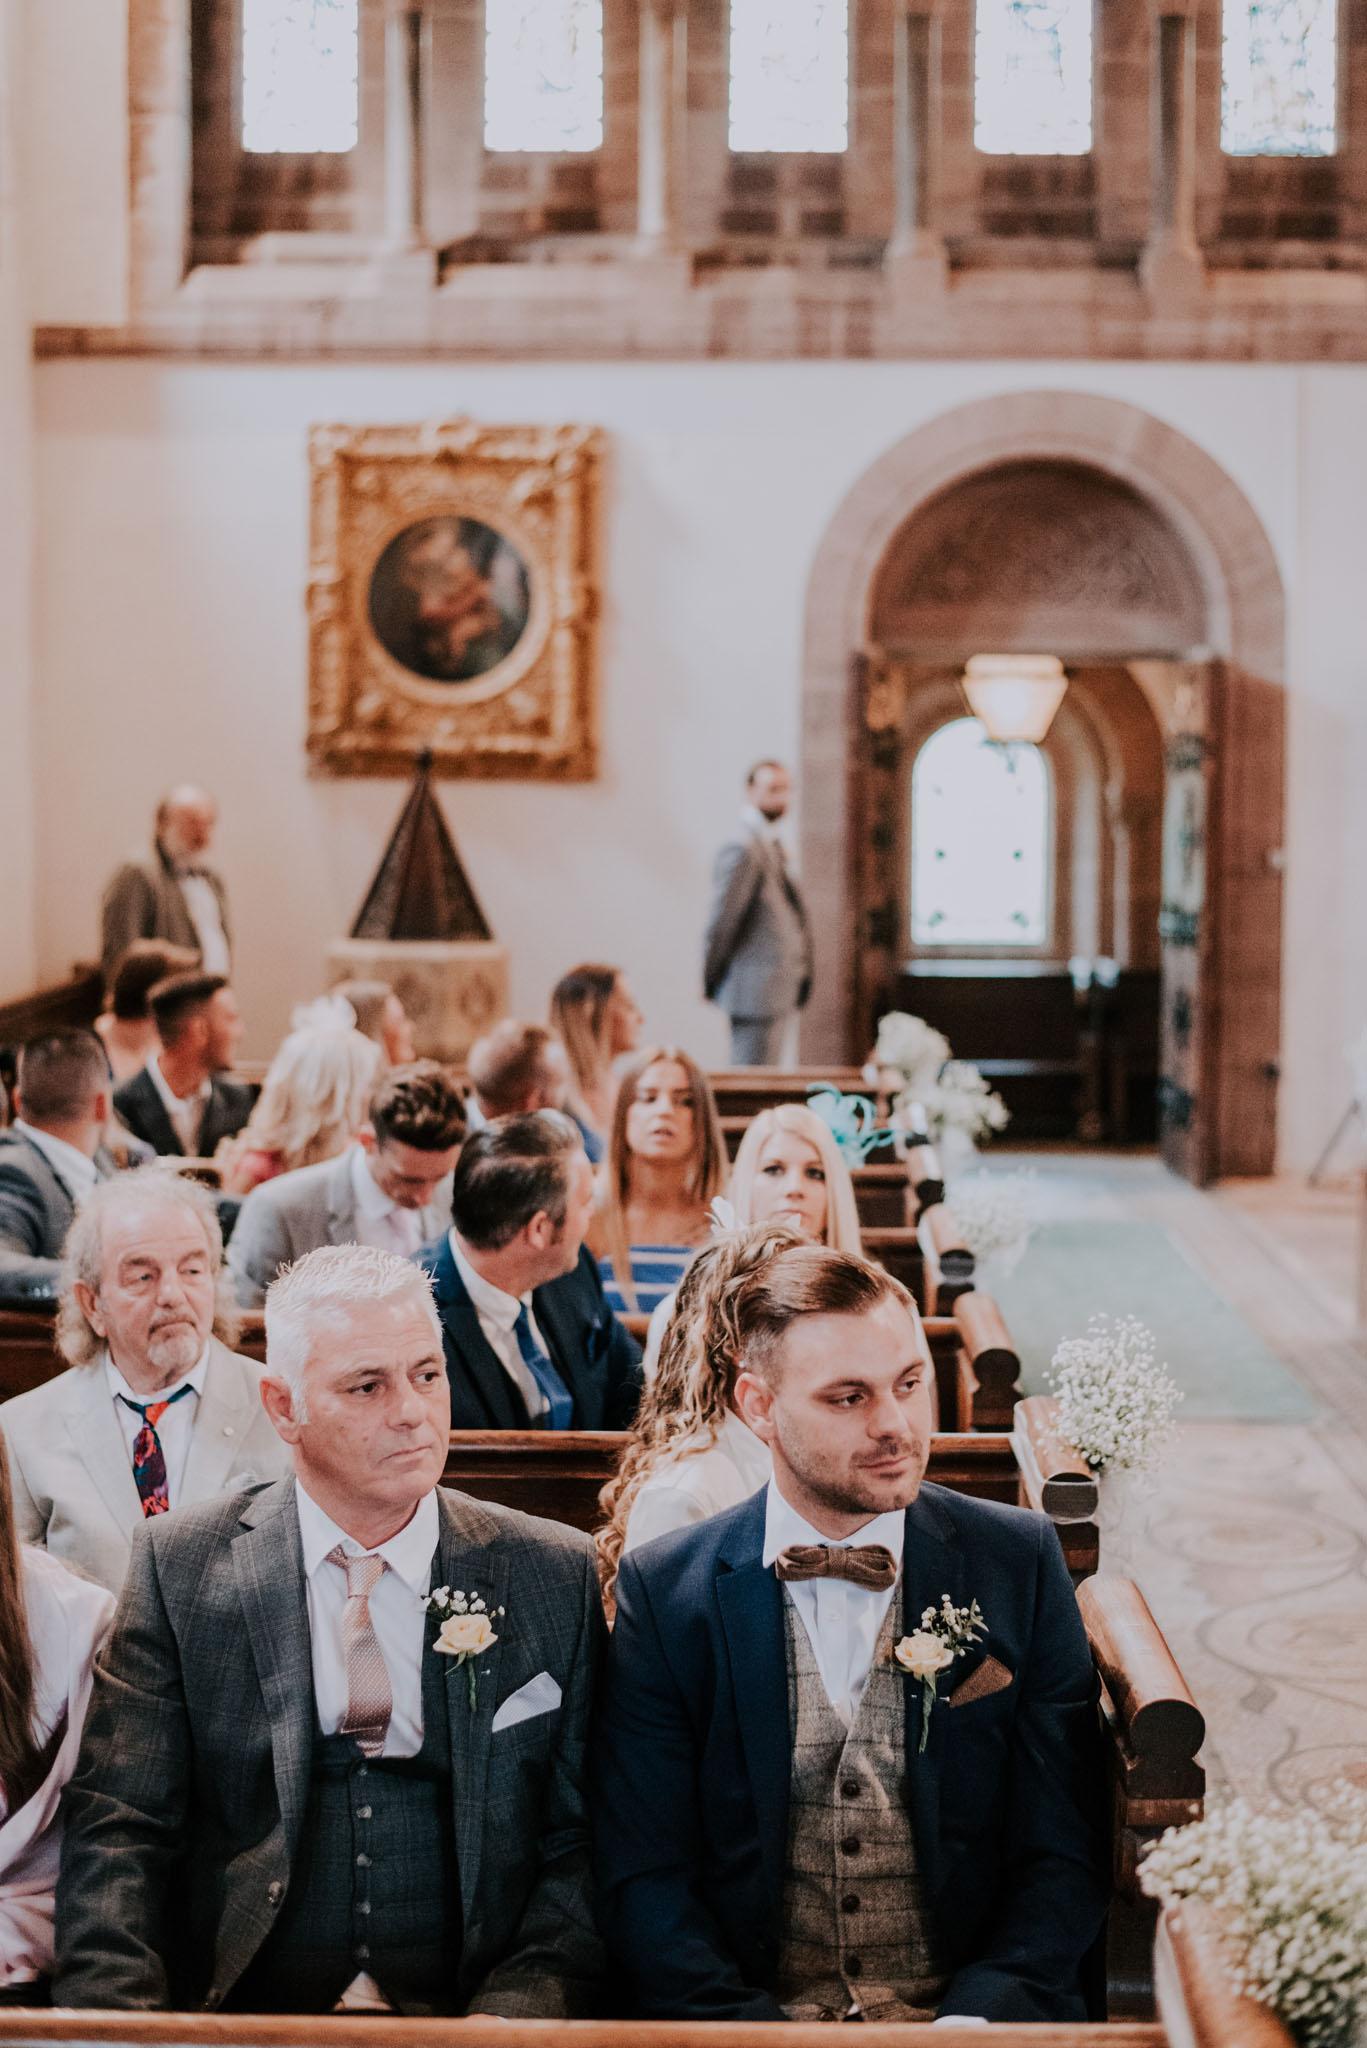 wedding-photographer-glewstone-court-hereford-scott-stockwell-photography152.jpg